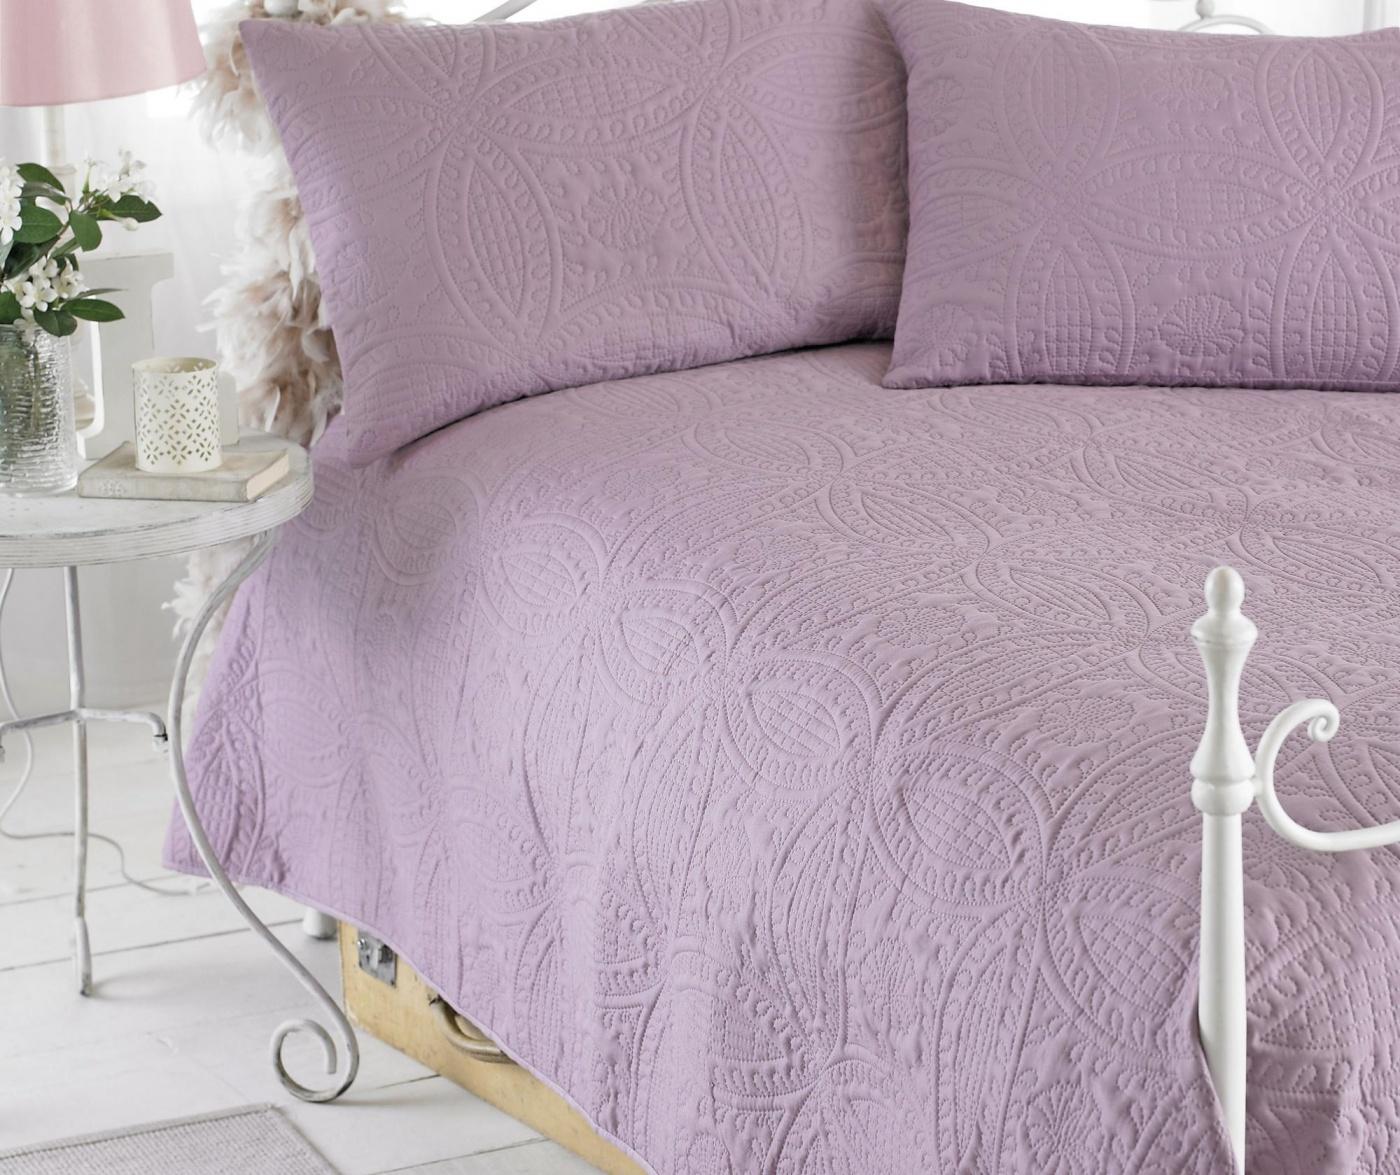 Set cuvertura matlasata King Parisienne Purple